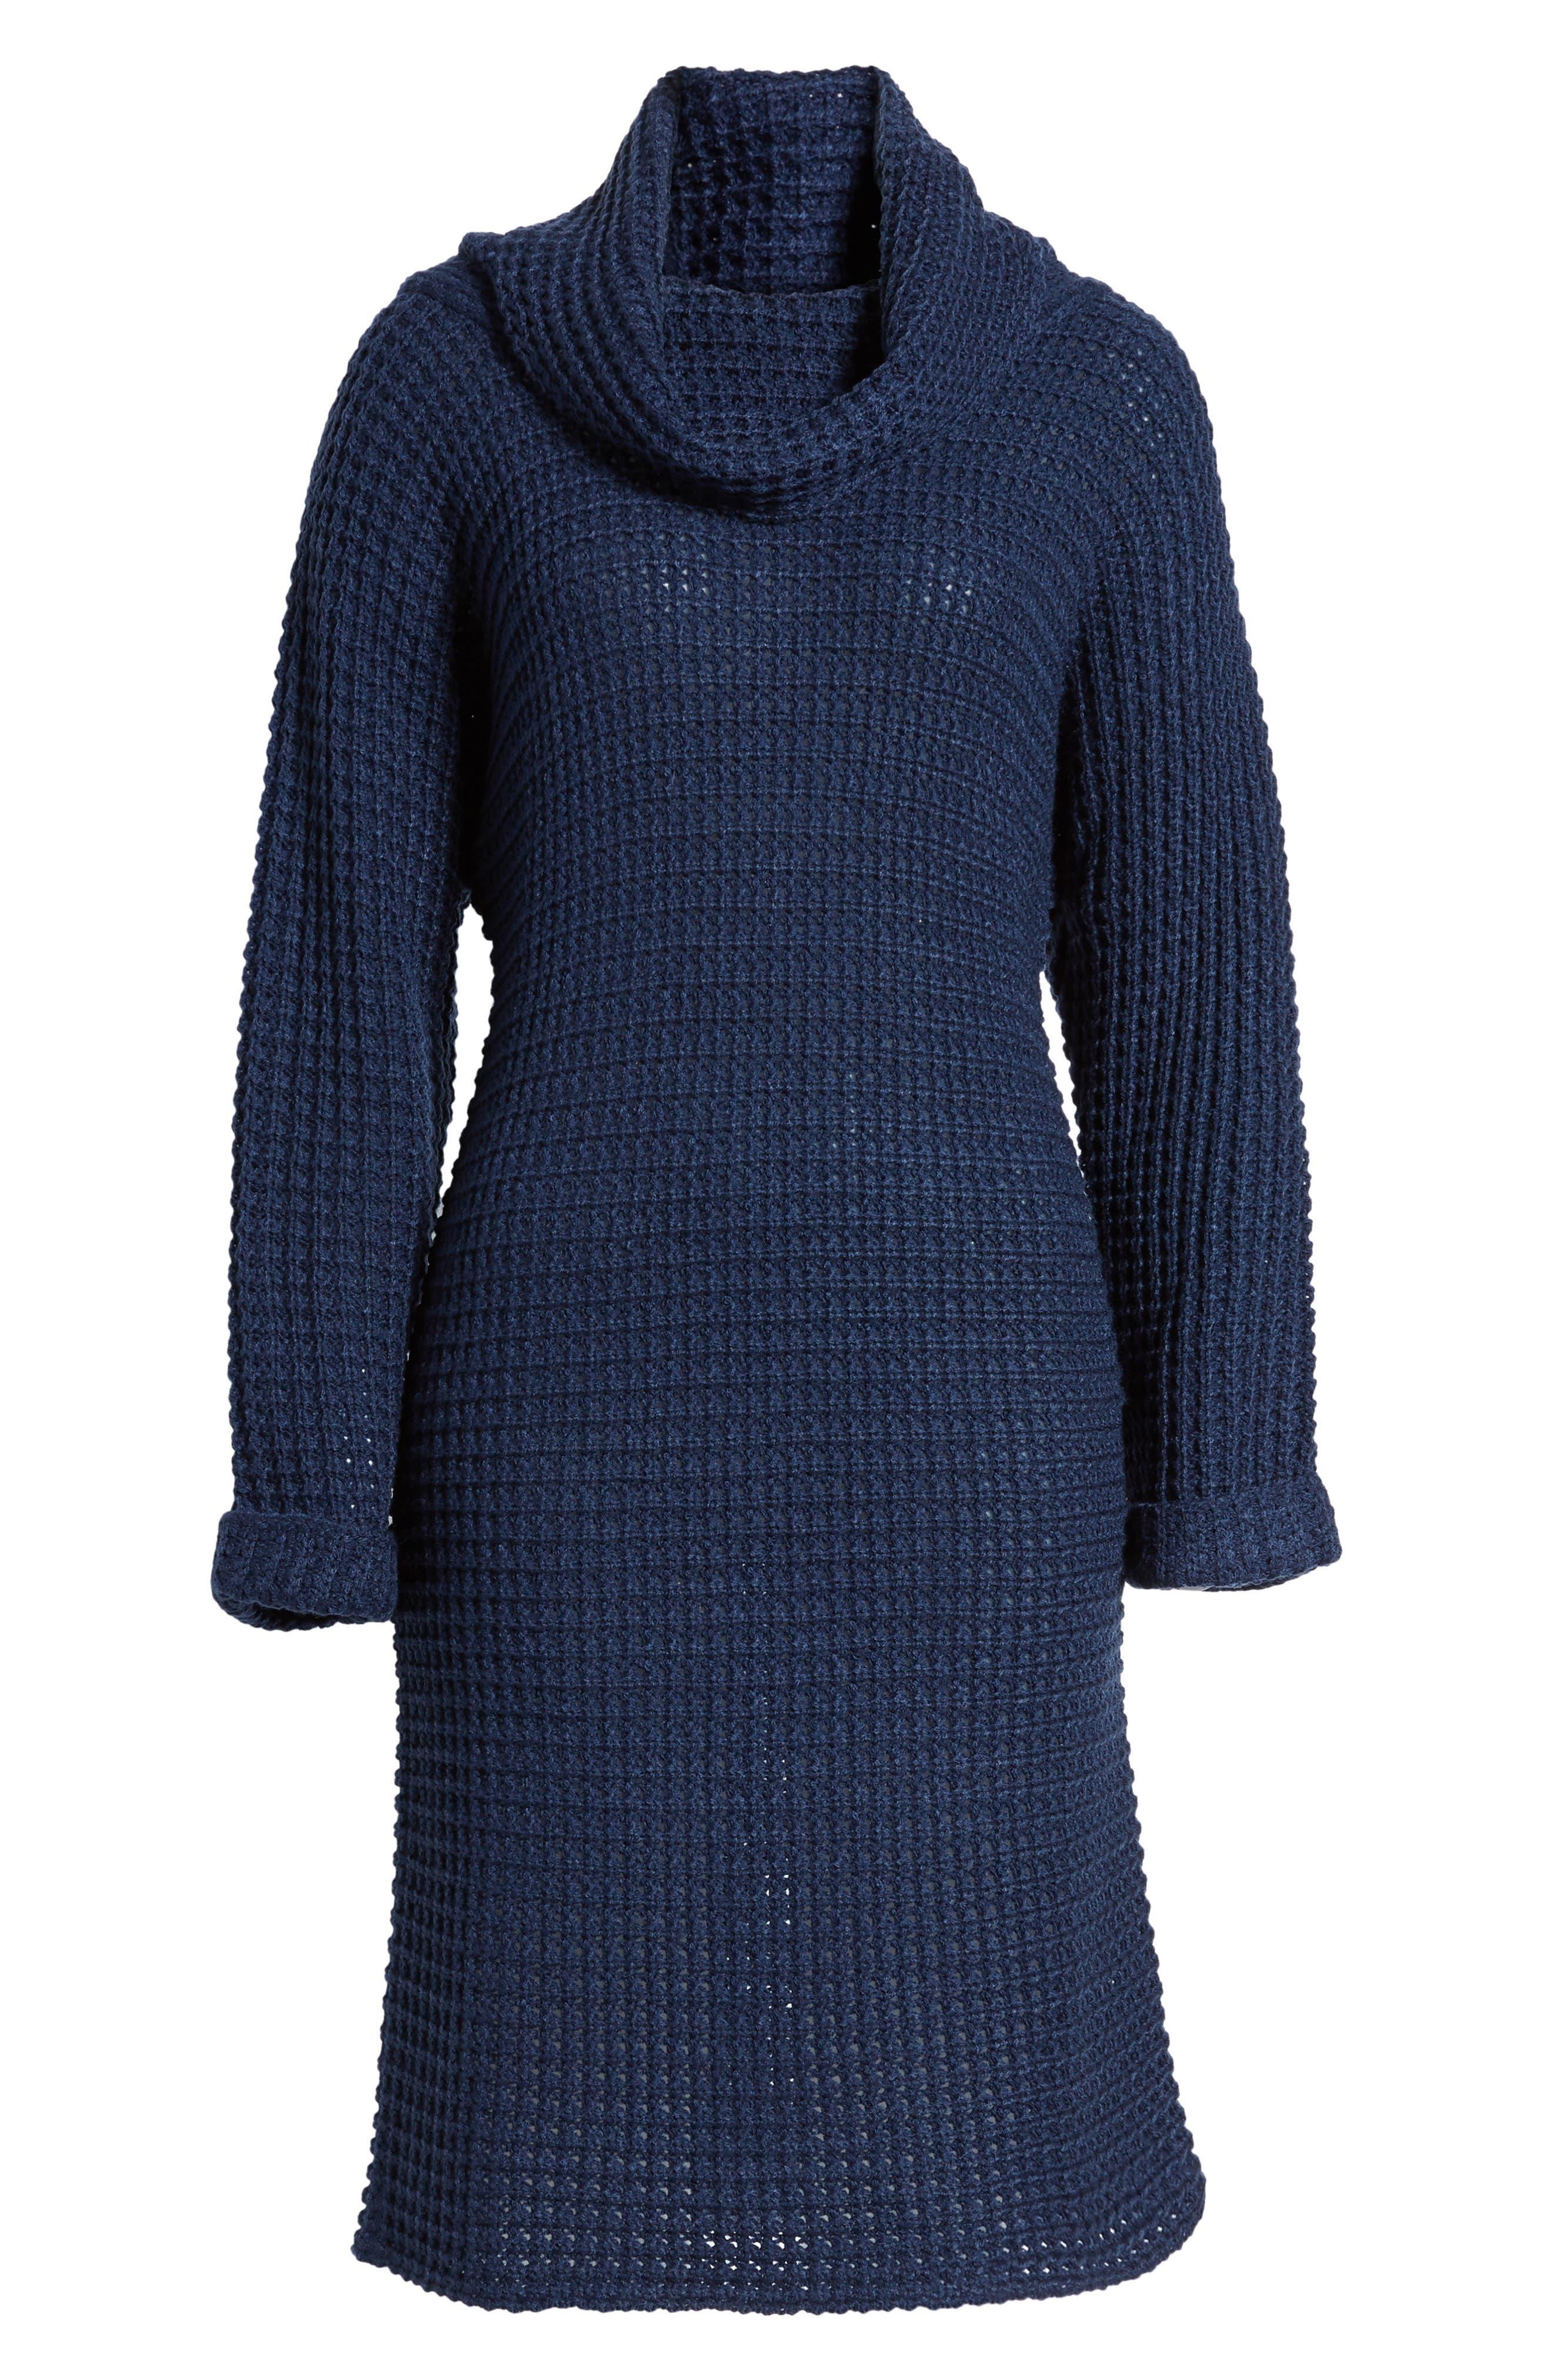 Turtleneck Sweater Dress,                             Alternate thumbnail 11, color,